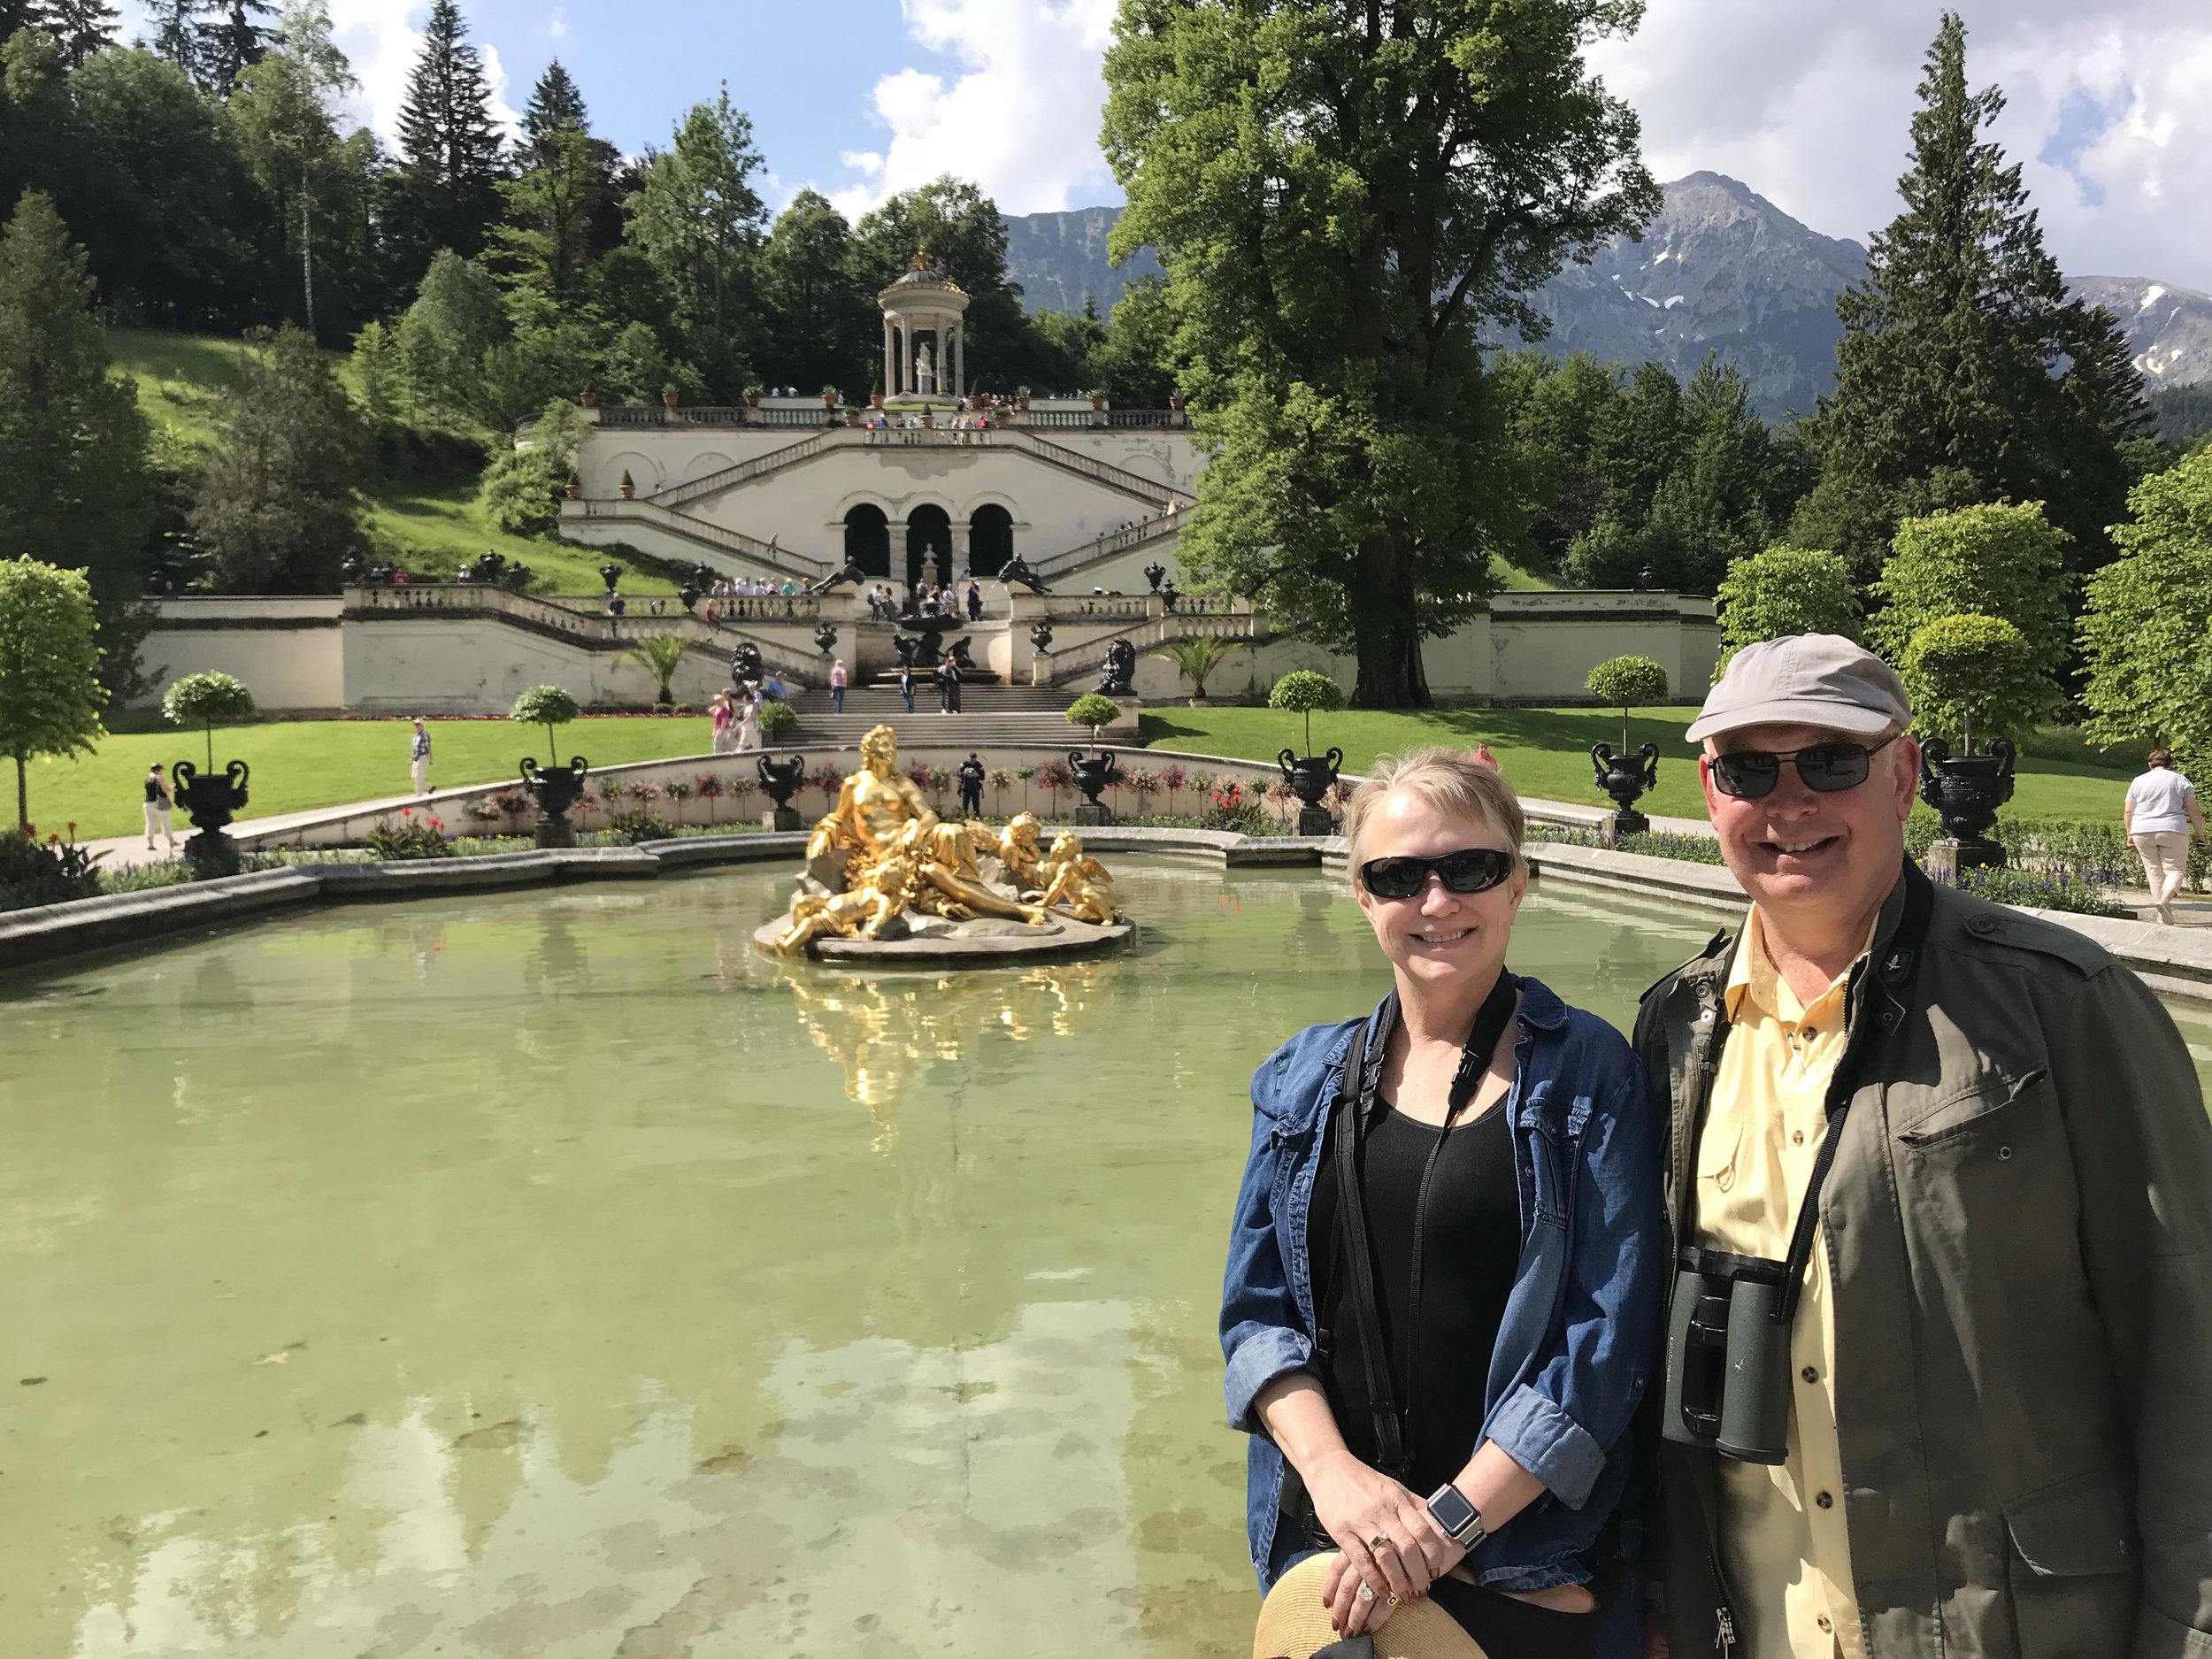 Teri_Day2_Castles_Germany&Austria_spiritedtable_photo44.jpg